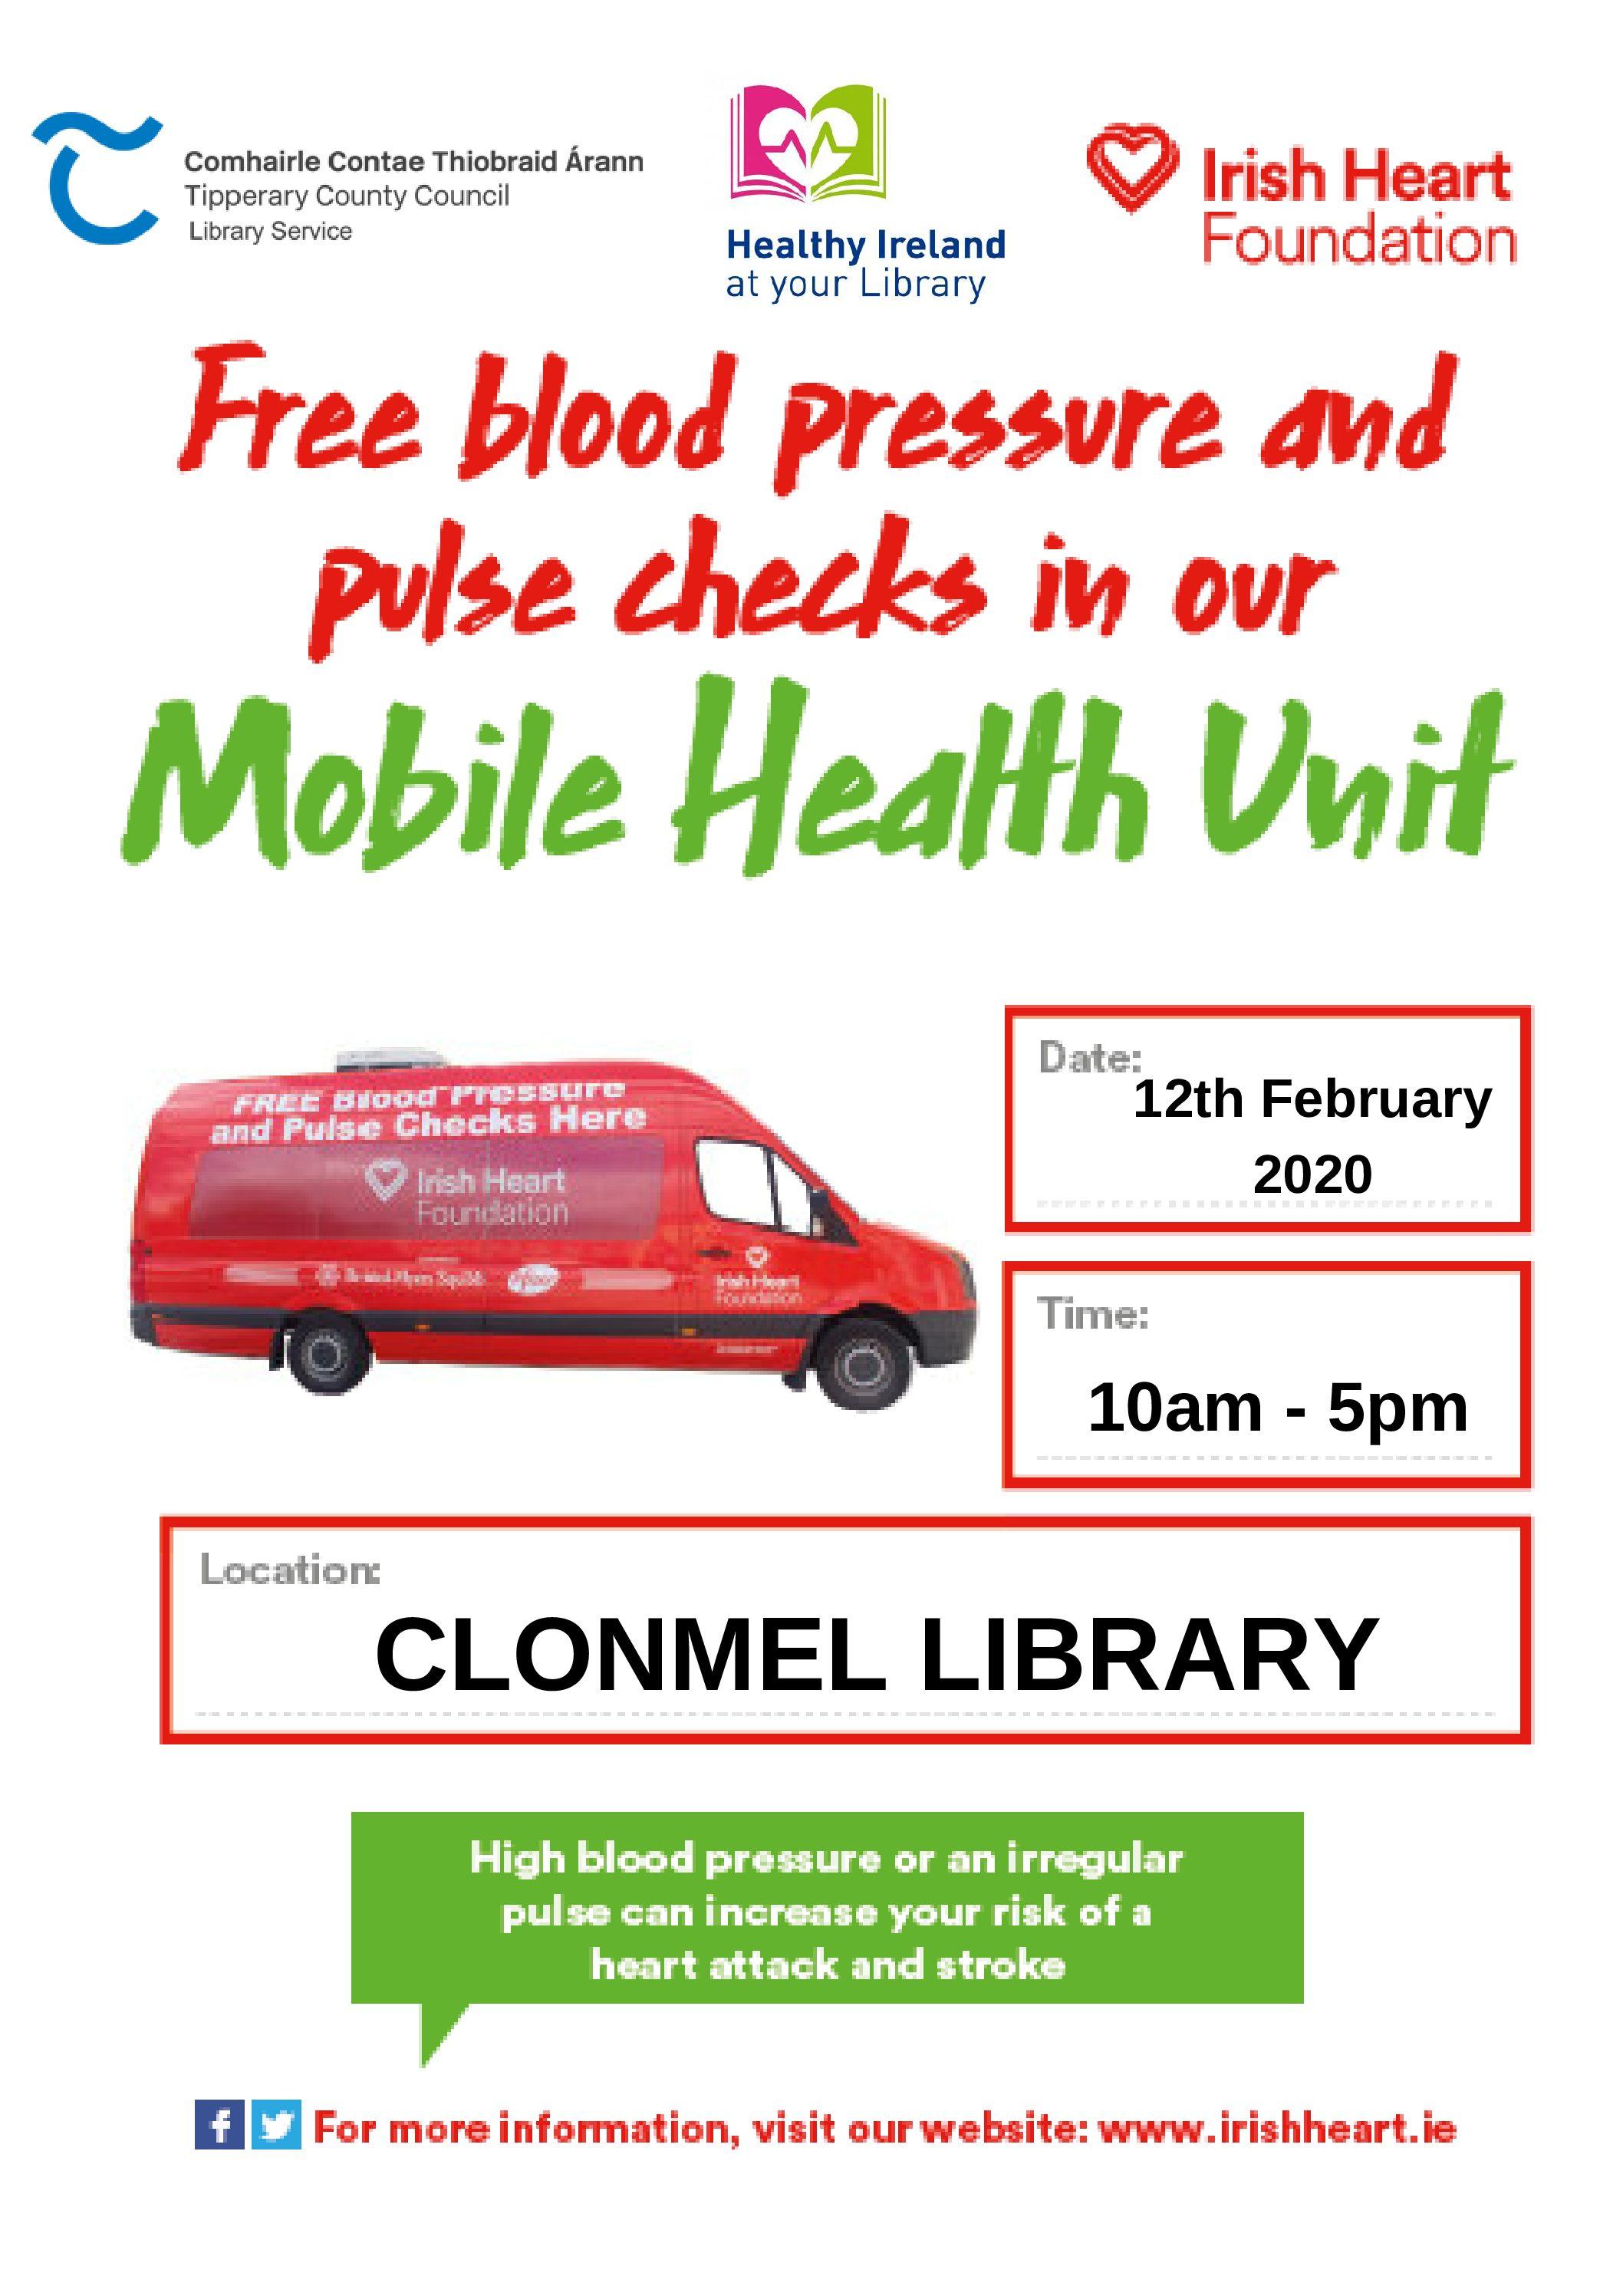 Clonmel Library: Free Blood Pressure & Pulse Checks